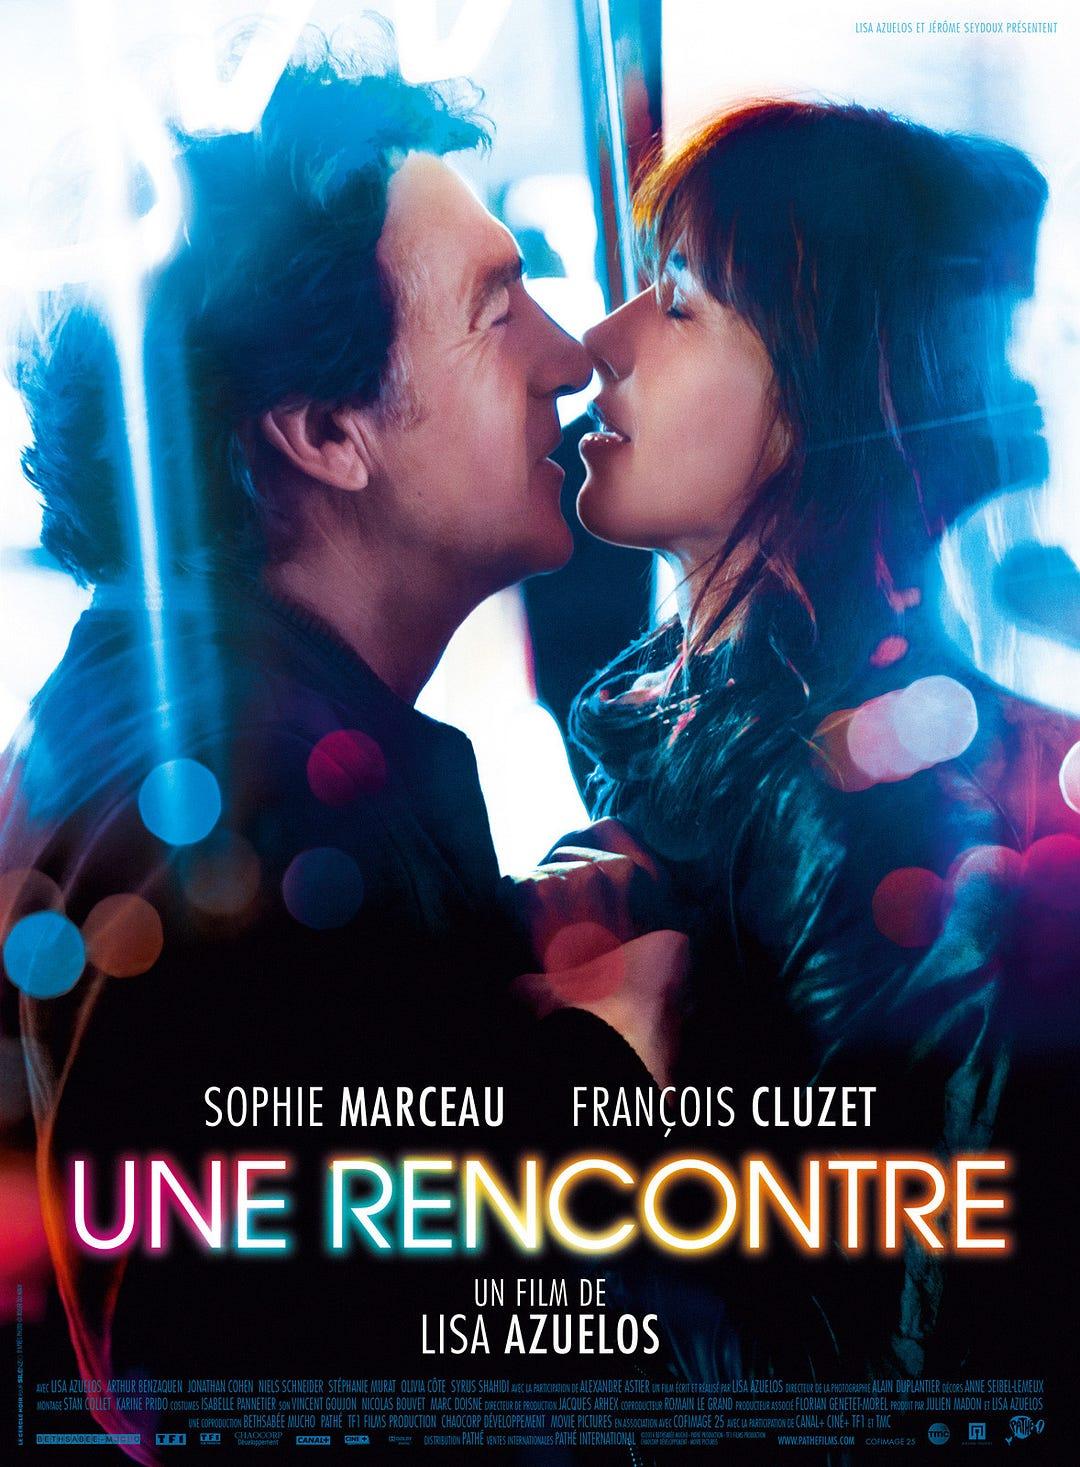 Fallen Film Complet Vf Youtube : fallen, complet, youtube, Regarder)~, Belle, Rencontre((2016)), Complet, FR Films, Meilleurs, Maintenant, Filmfrance, Medium